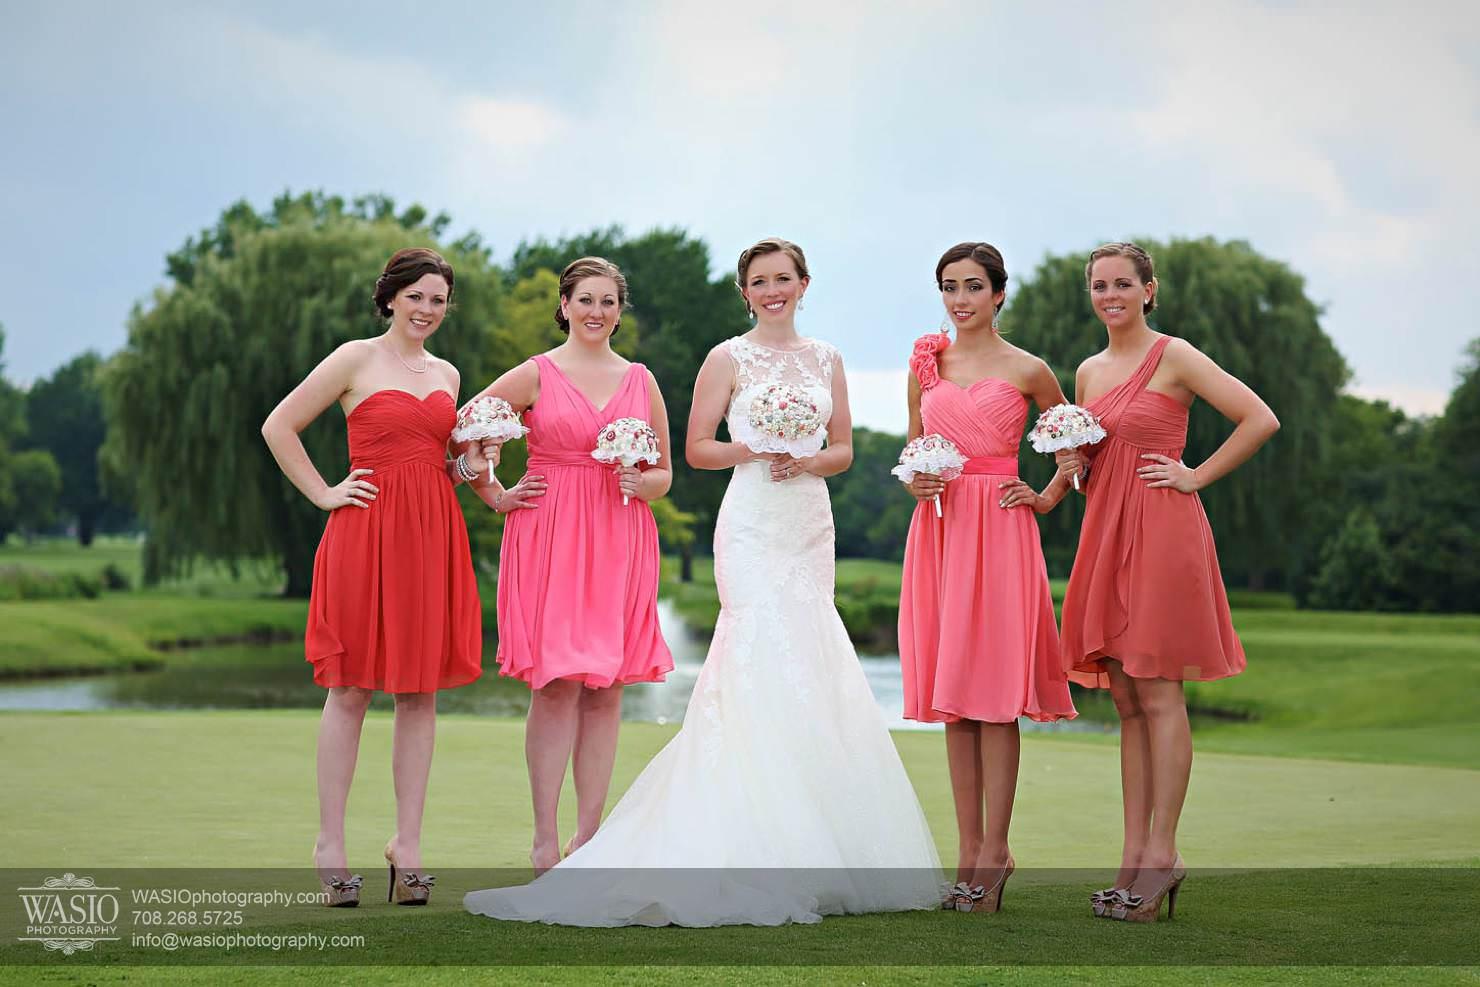 golf-course-wedding-summer-bridesmaids-chevy-chase-country-club Chevy Chase Country Club Wedding - Elizabeth & Michael